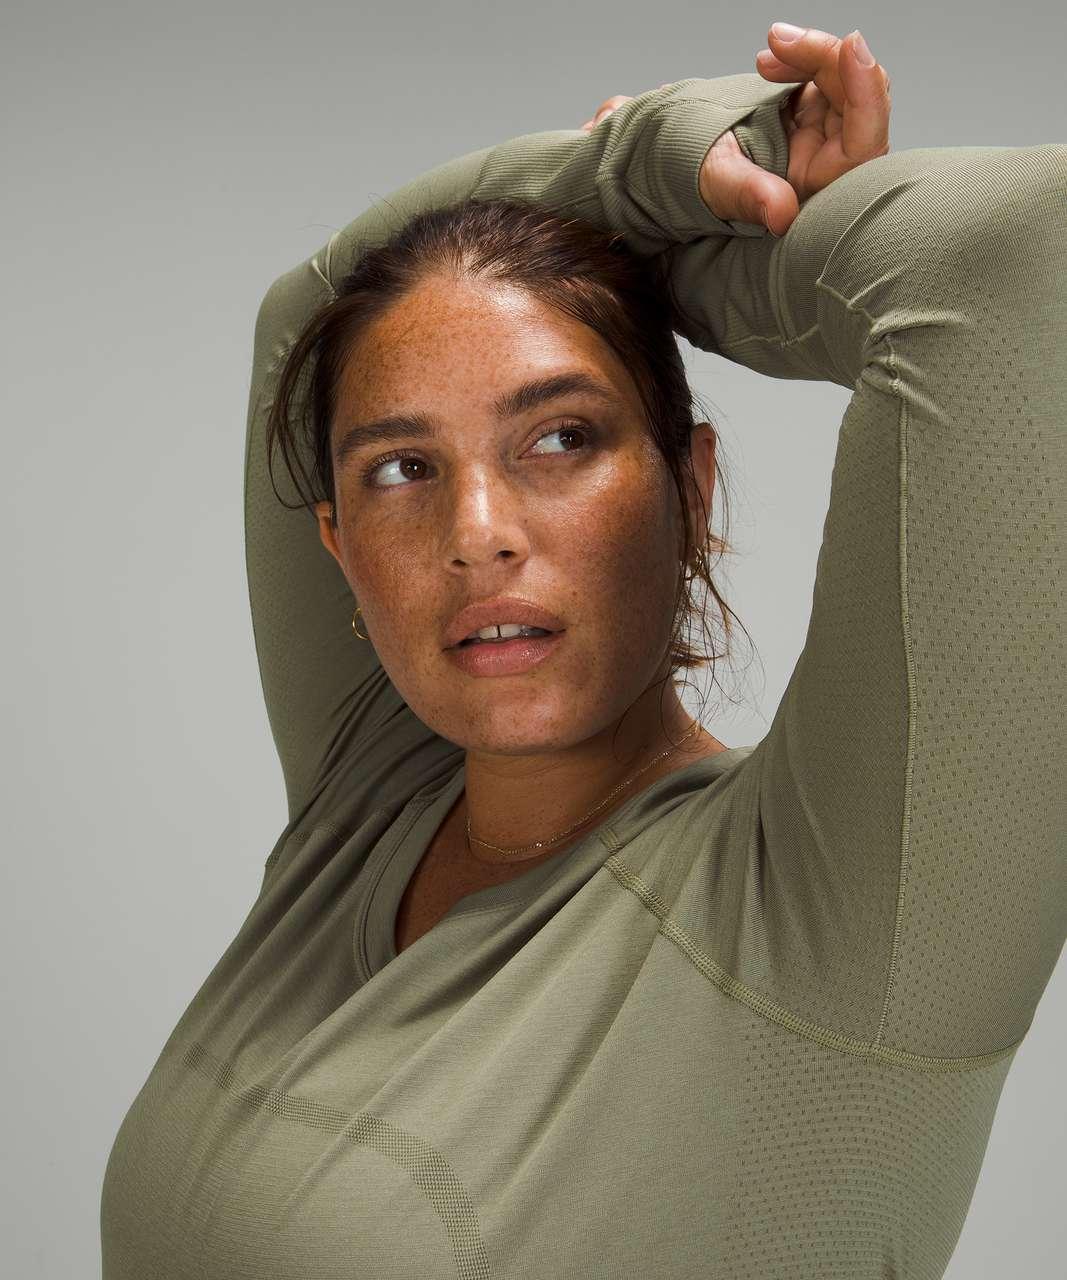 Lululemon Swiftly Tech Long Sleeve 2.0 *Race Length - Rosemary Green / Rosemary Green